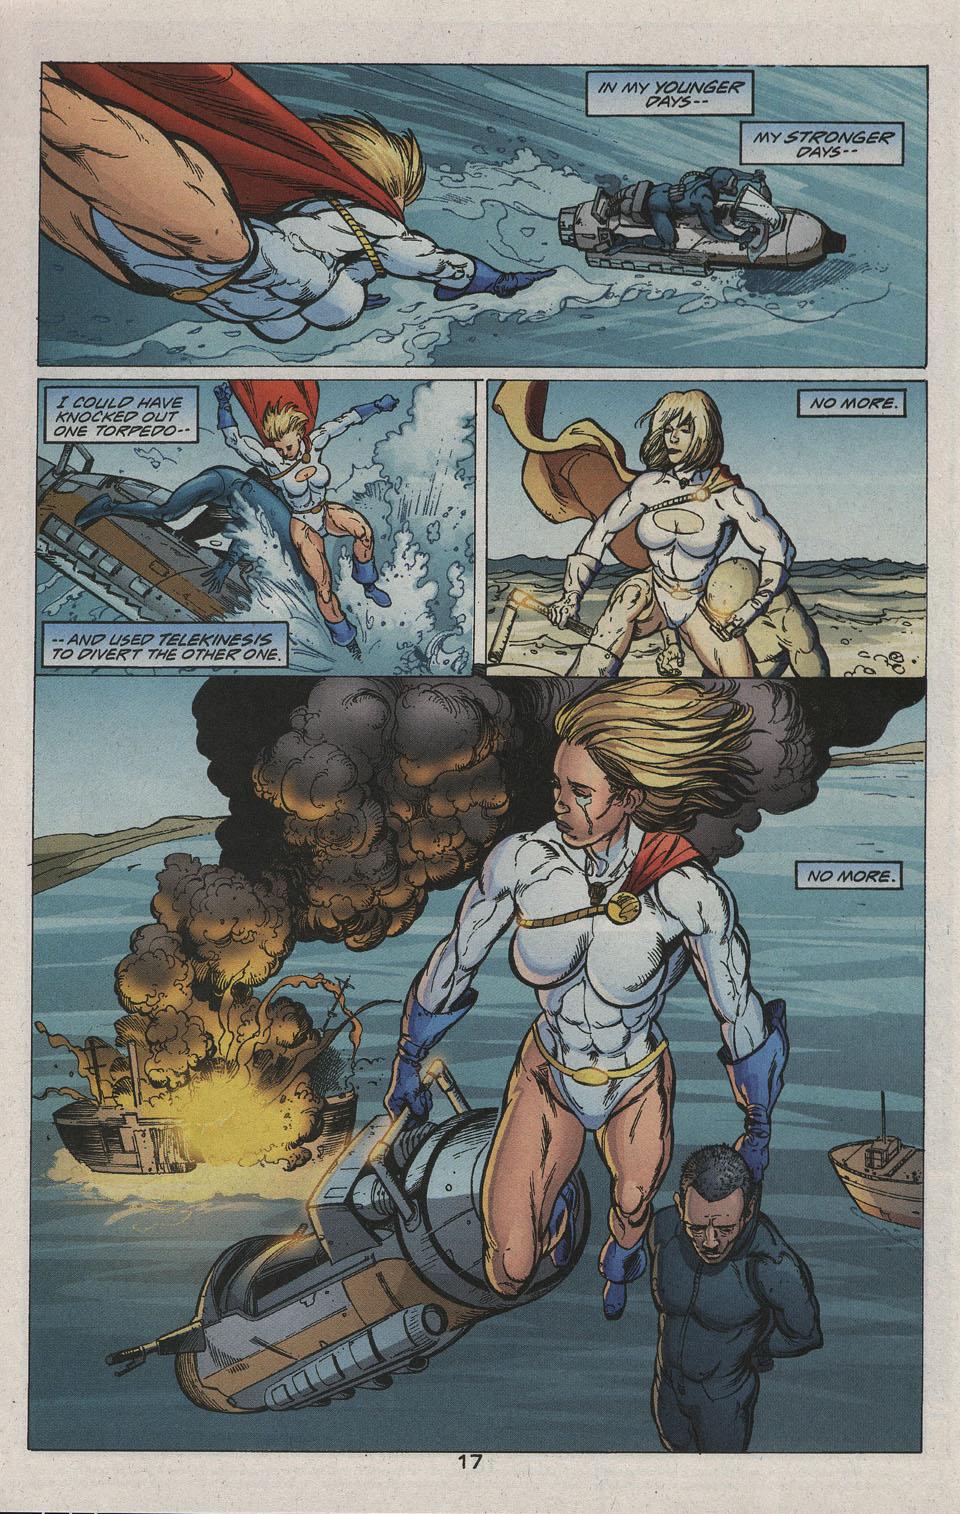 042 17 powergirl.jpg